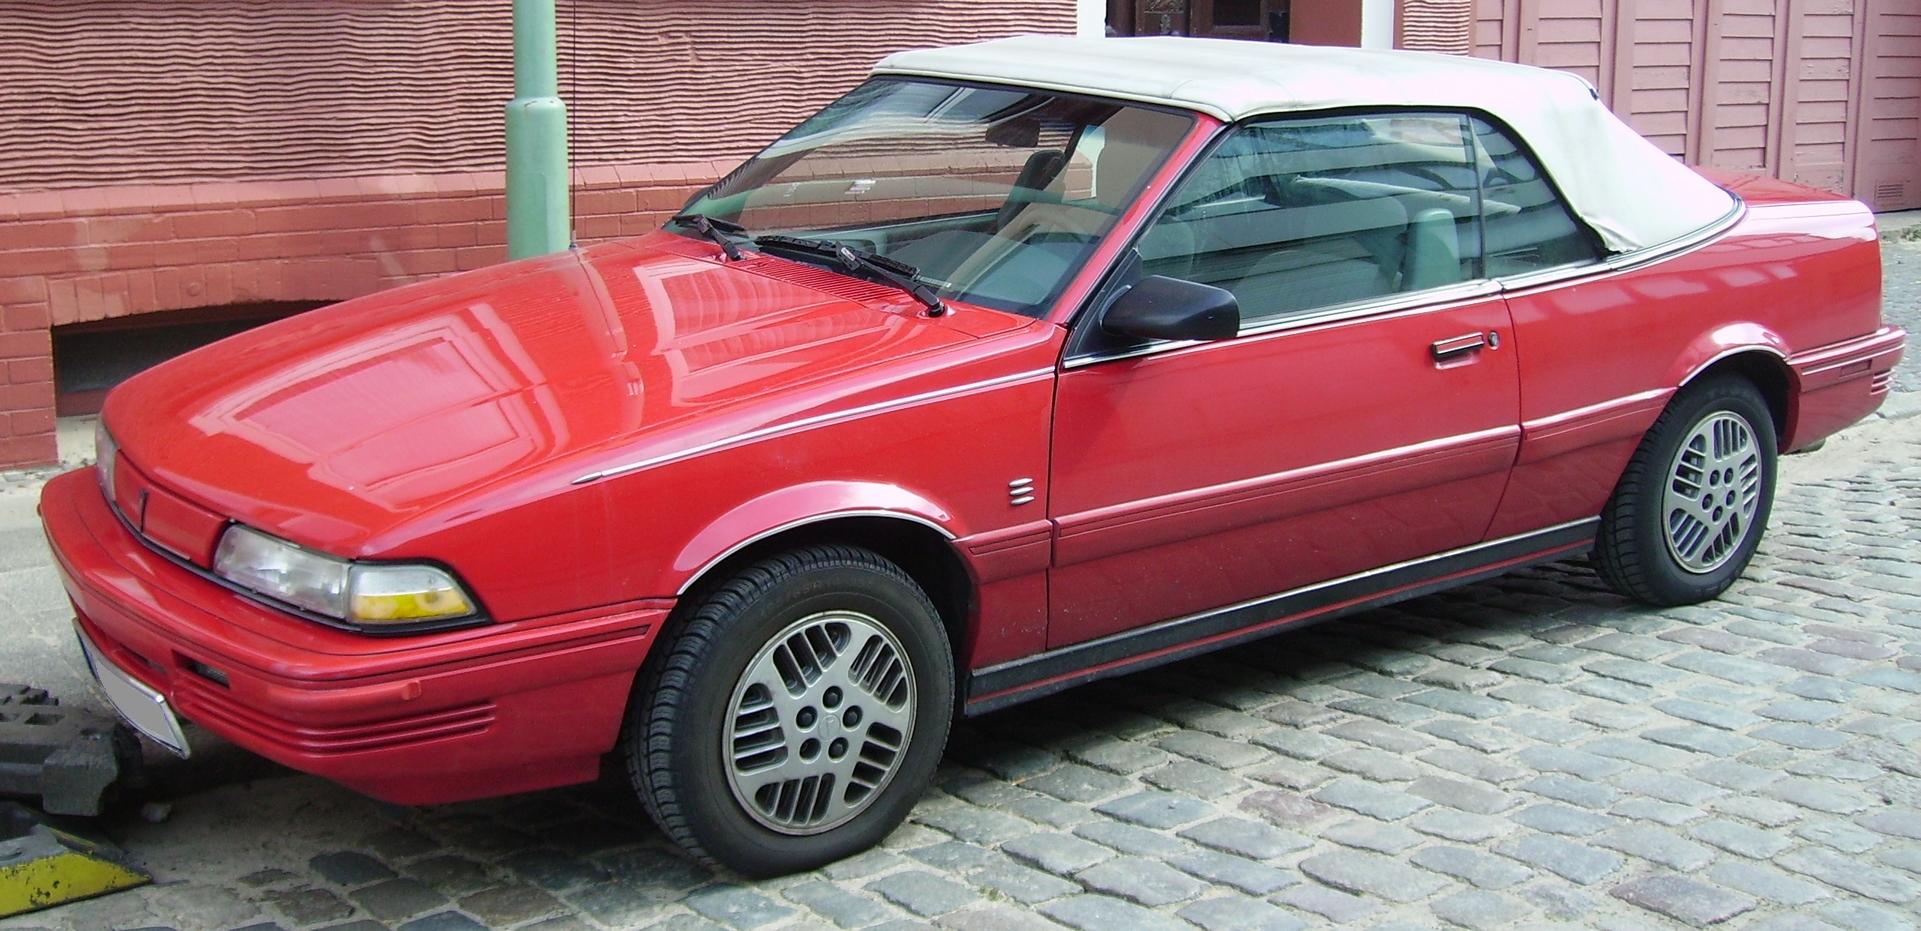 Pontiac Sunbird 1989 Photo - 1